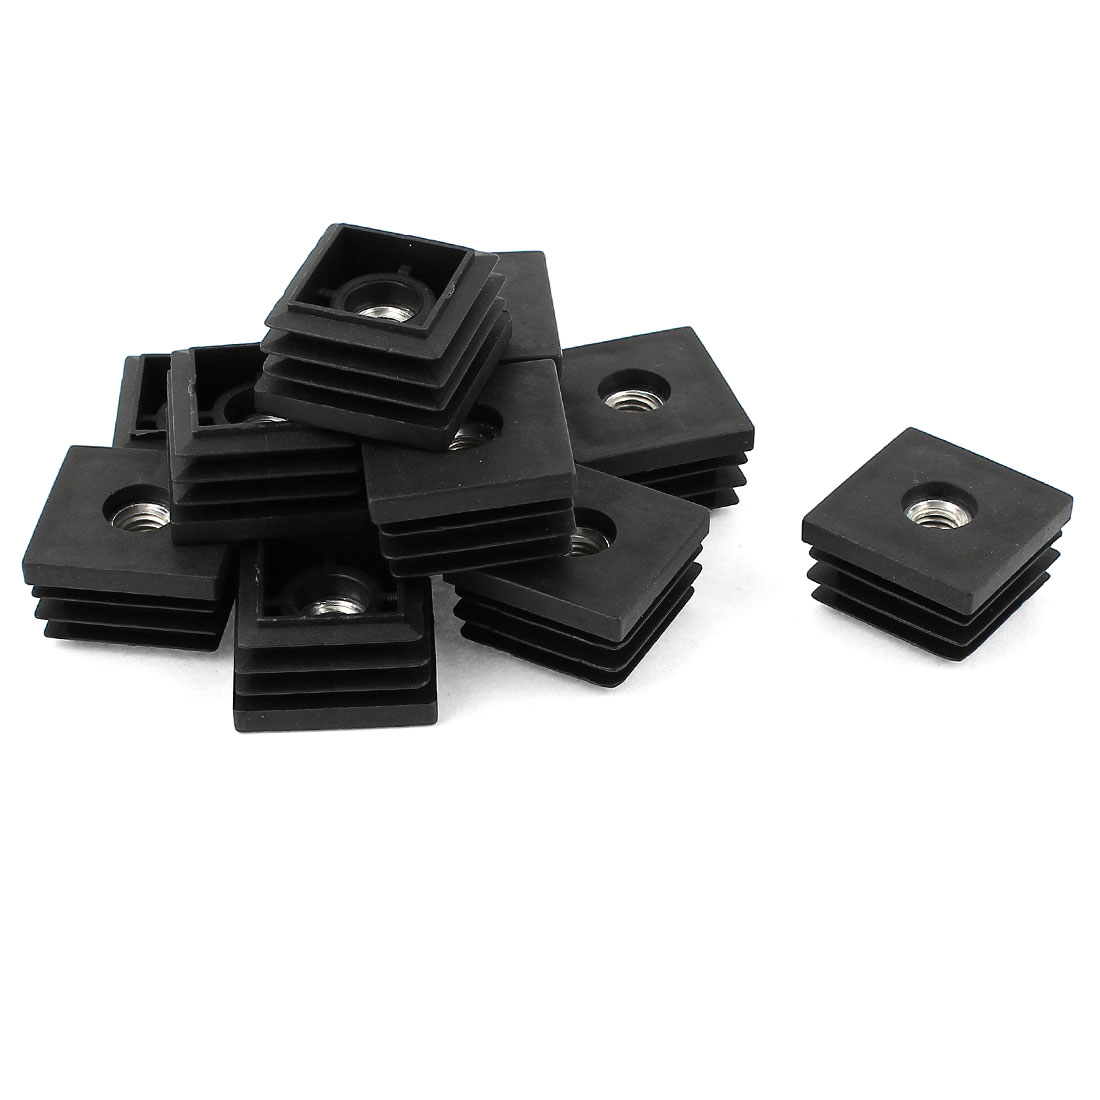 Unique Bargains 12 Pieces Black 7mm Dia Thread Blanking End Cap Threaded Pipe Insert 30mm x 30mm